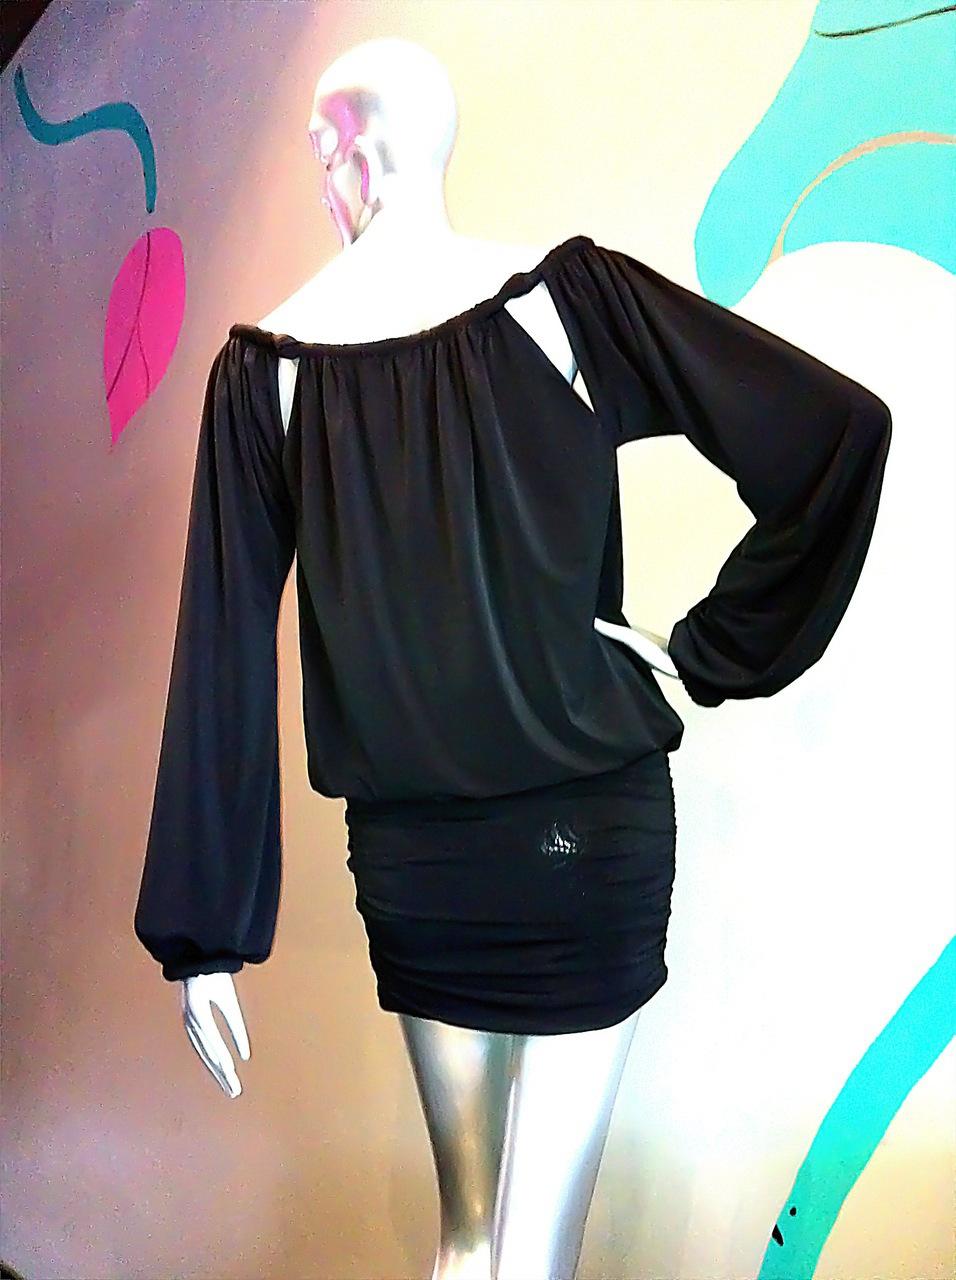 drapping_dress__92703.1392863574.1280.1280.JPG